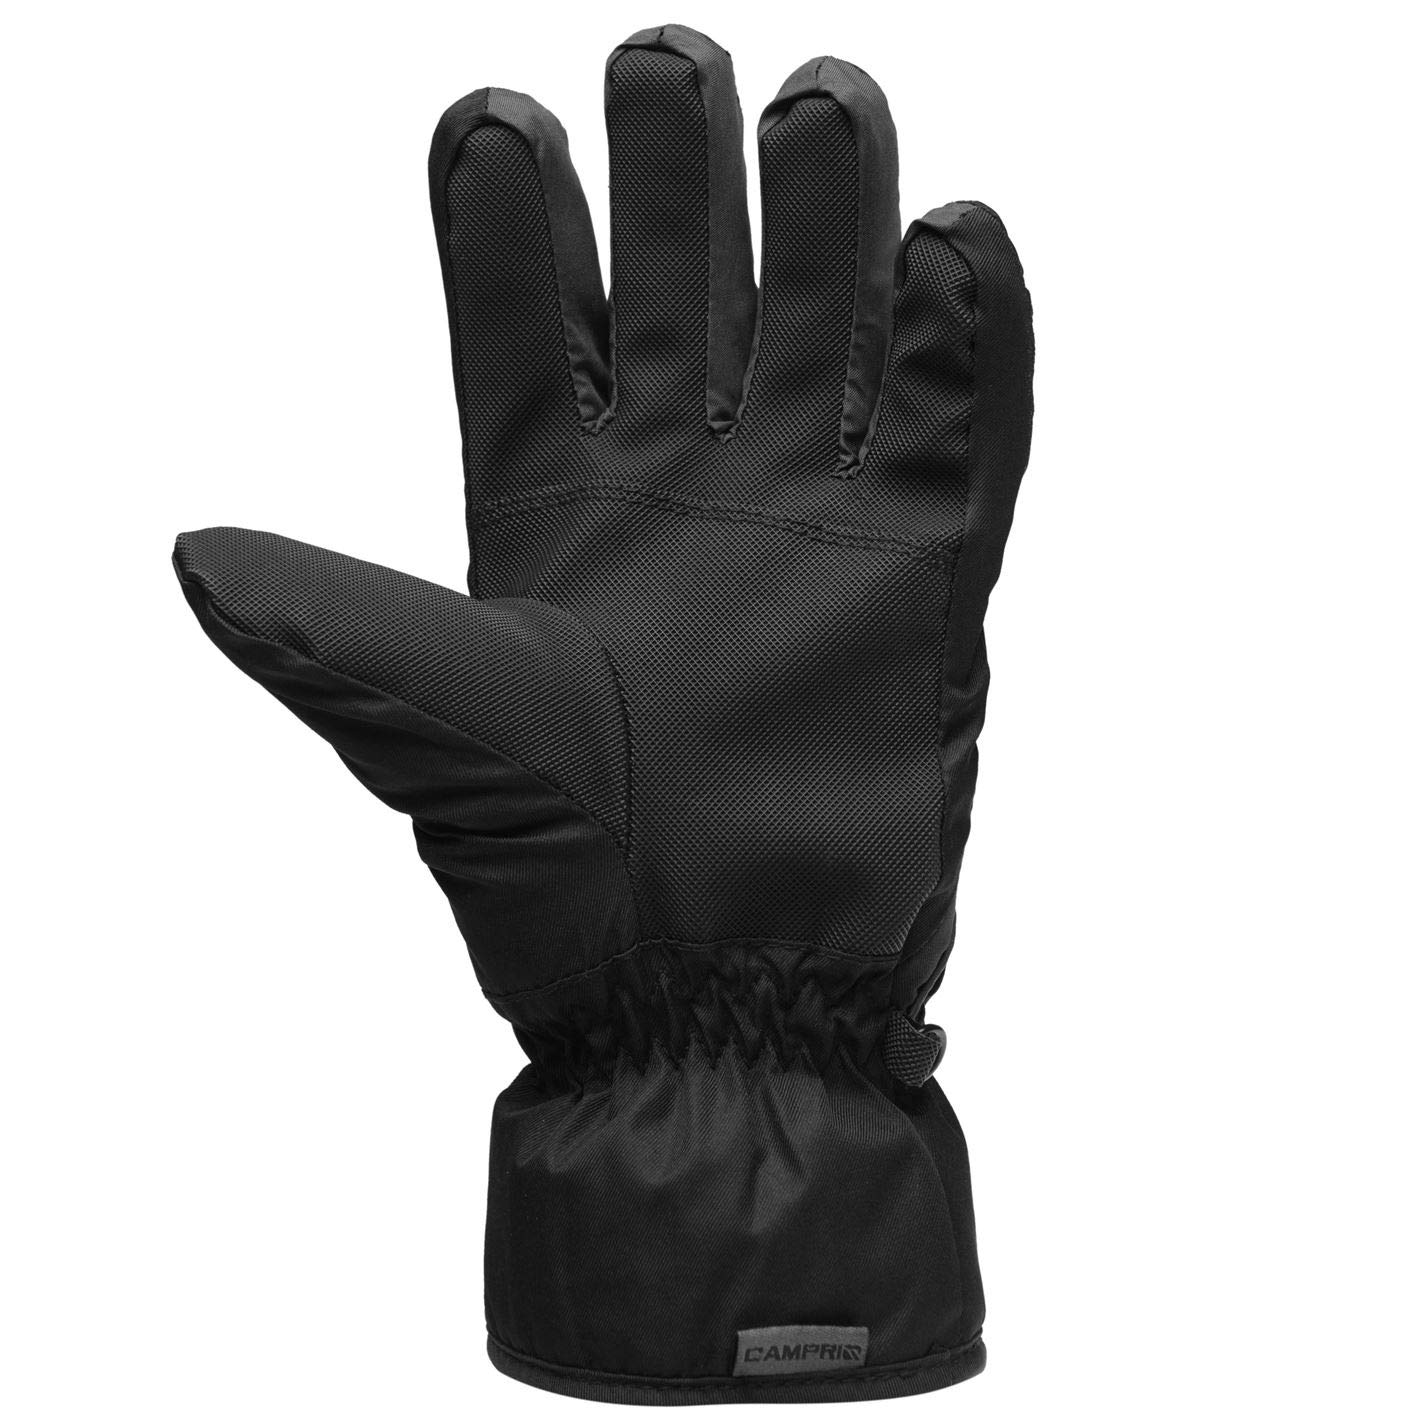 Campri Boys Ski Gloves Winter Sports Juniors Snow